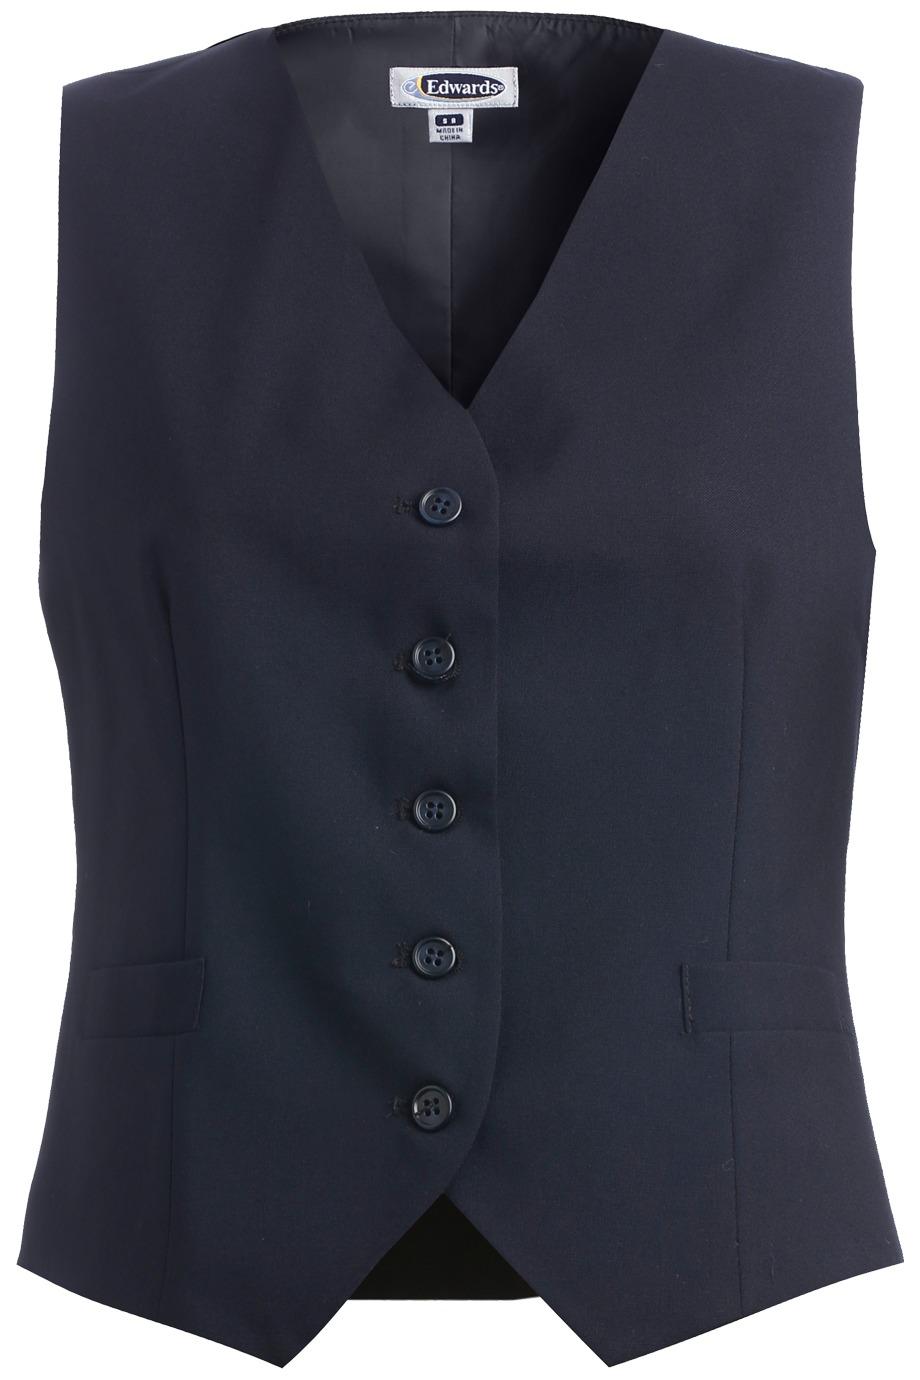 Edwards Garment 7680 - High Button Vest